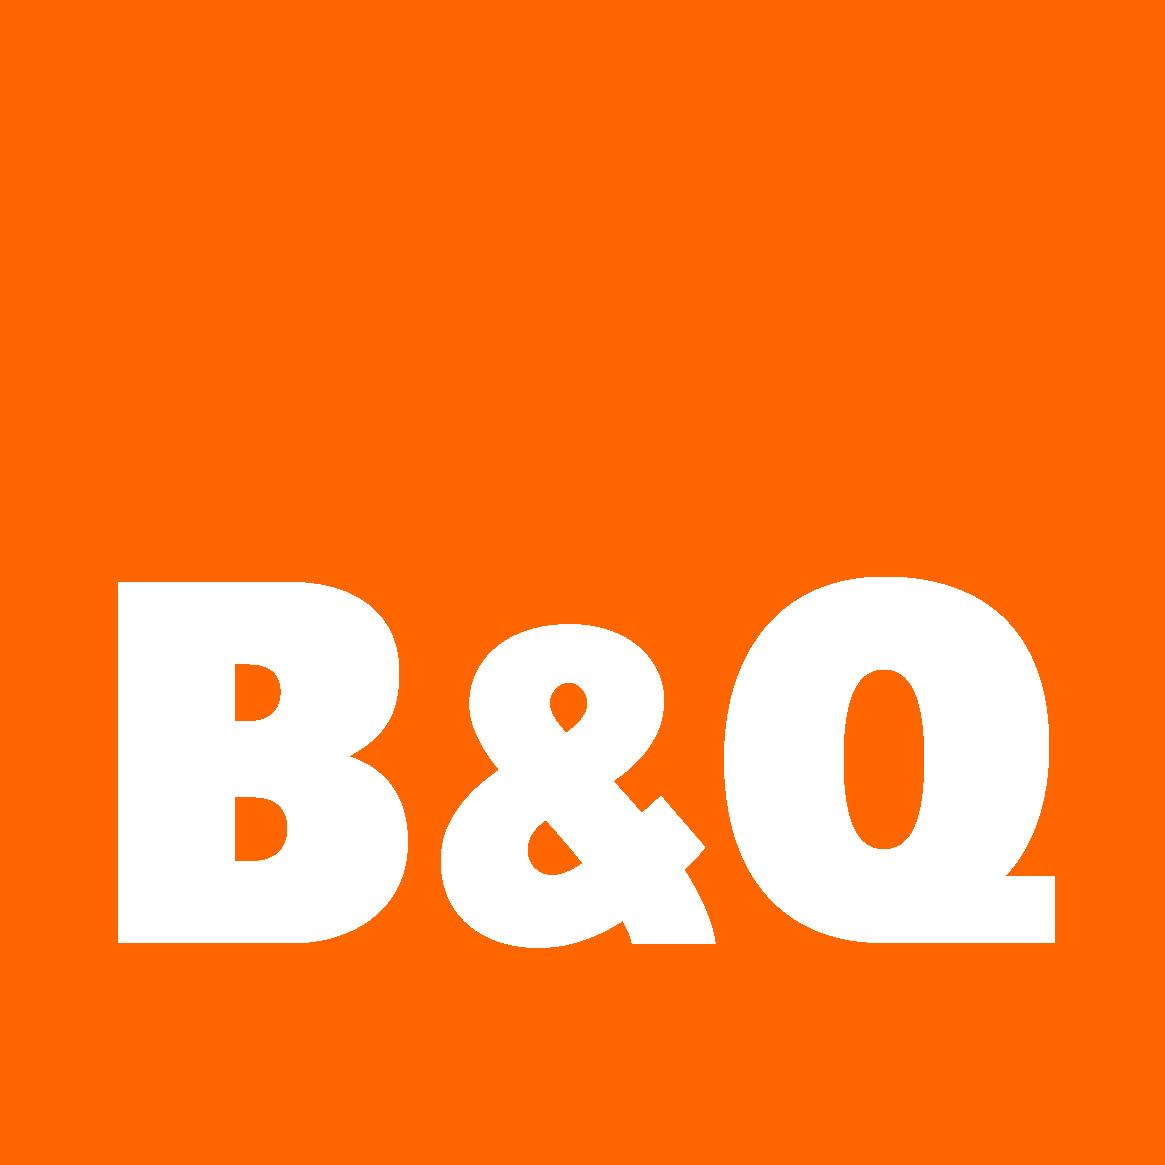 B&Q.jpg